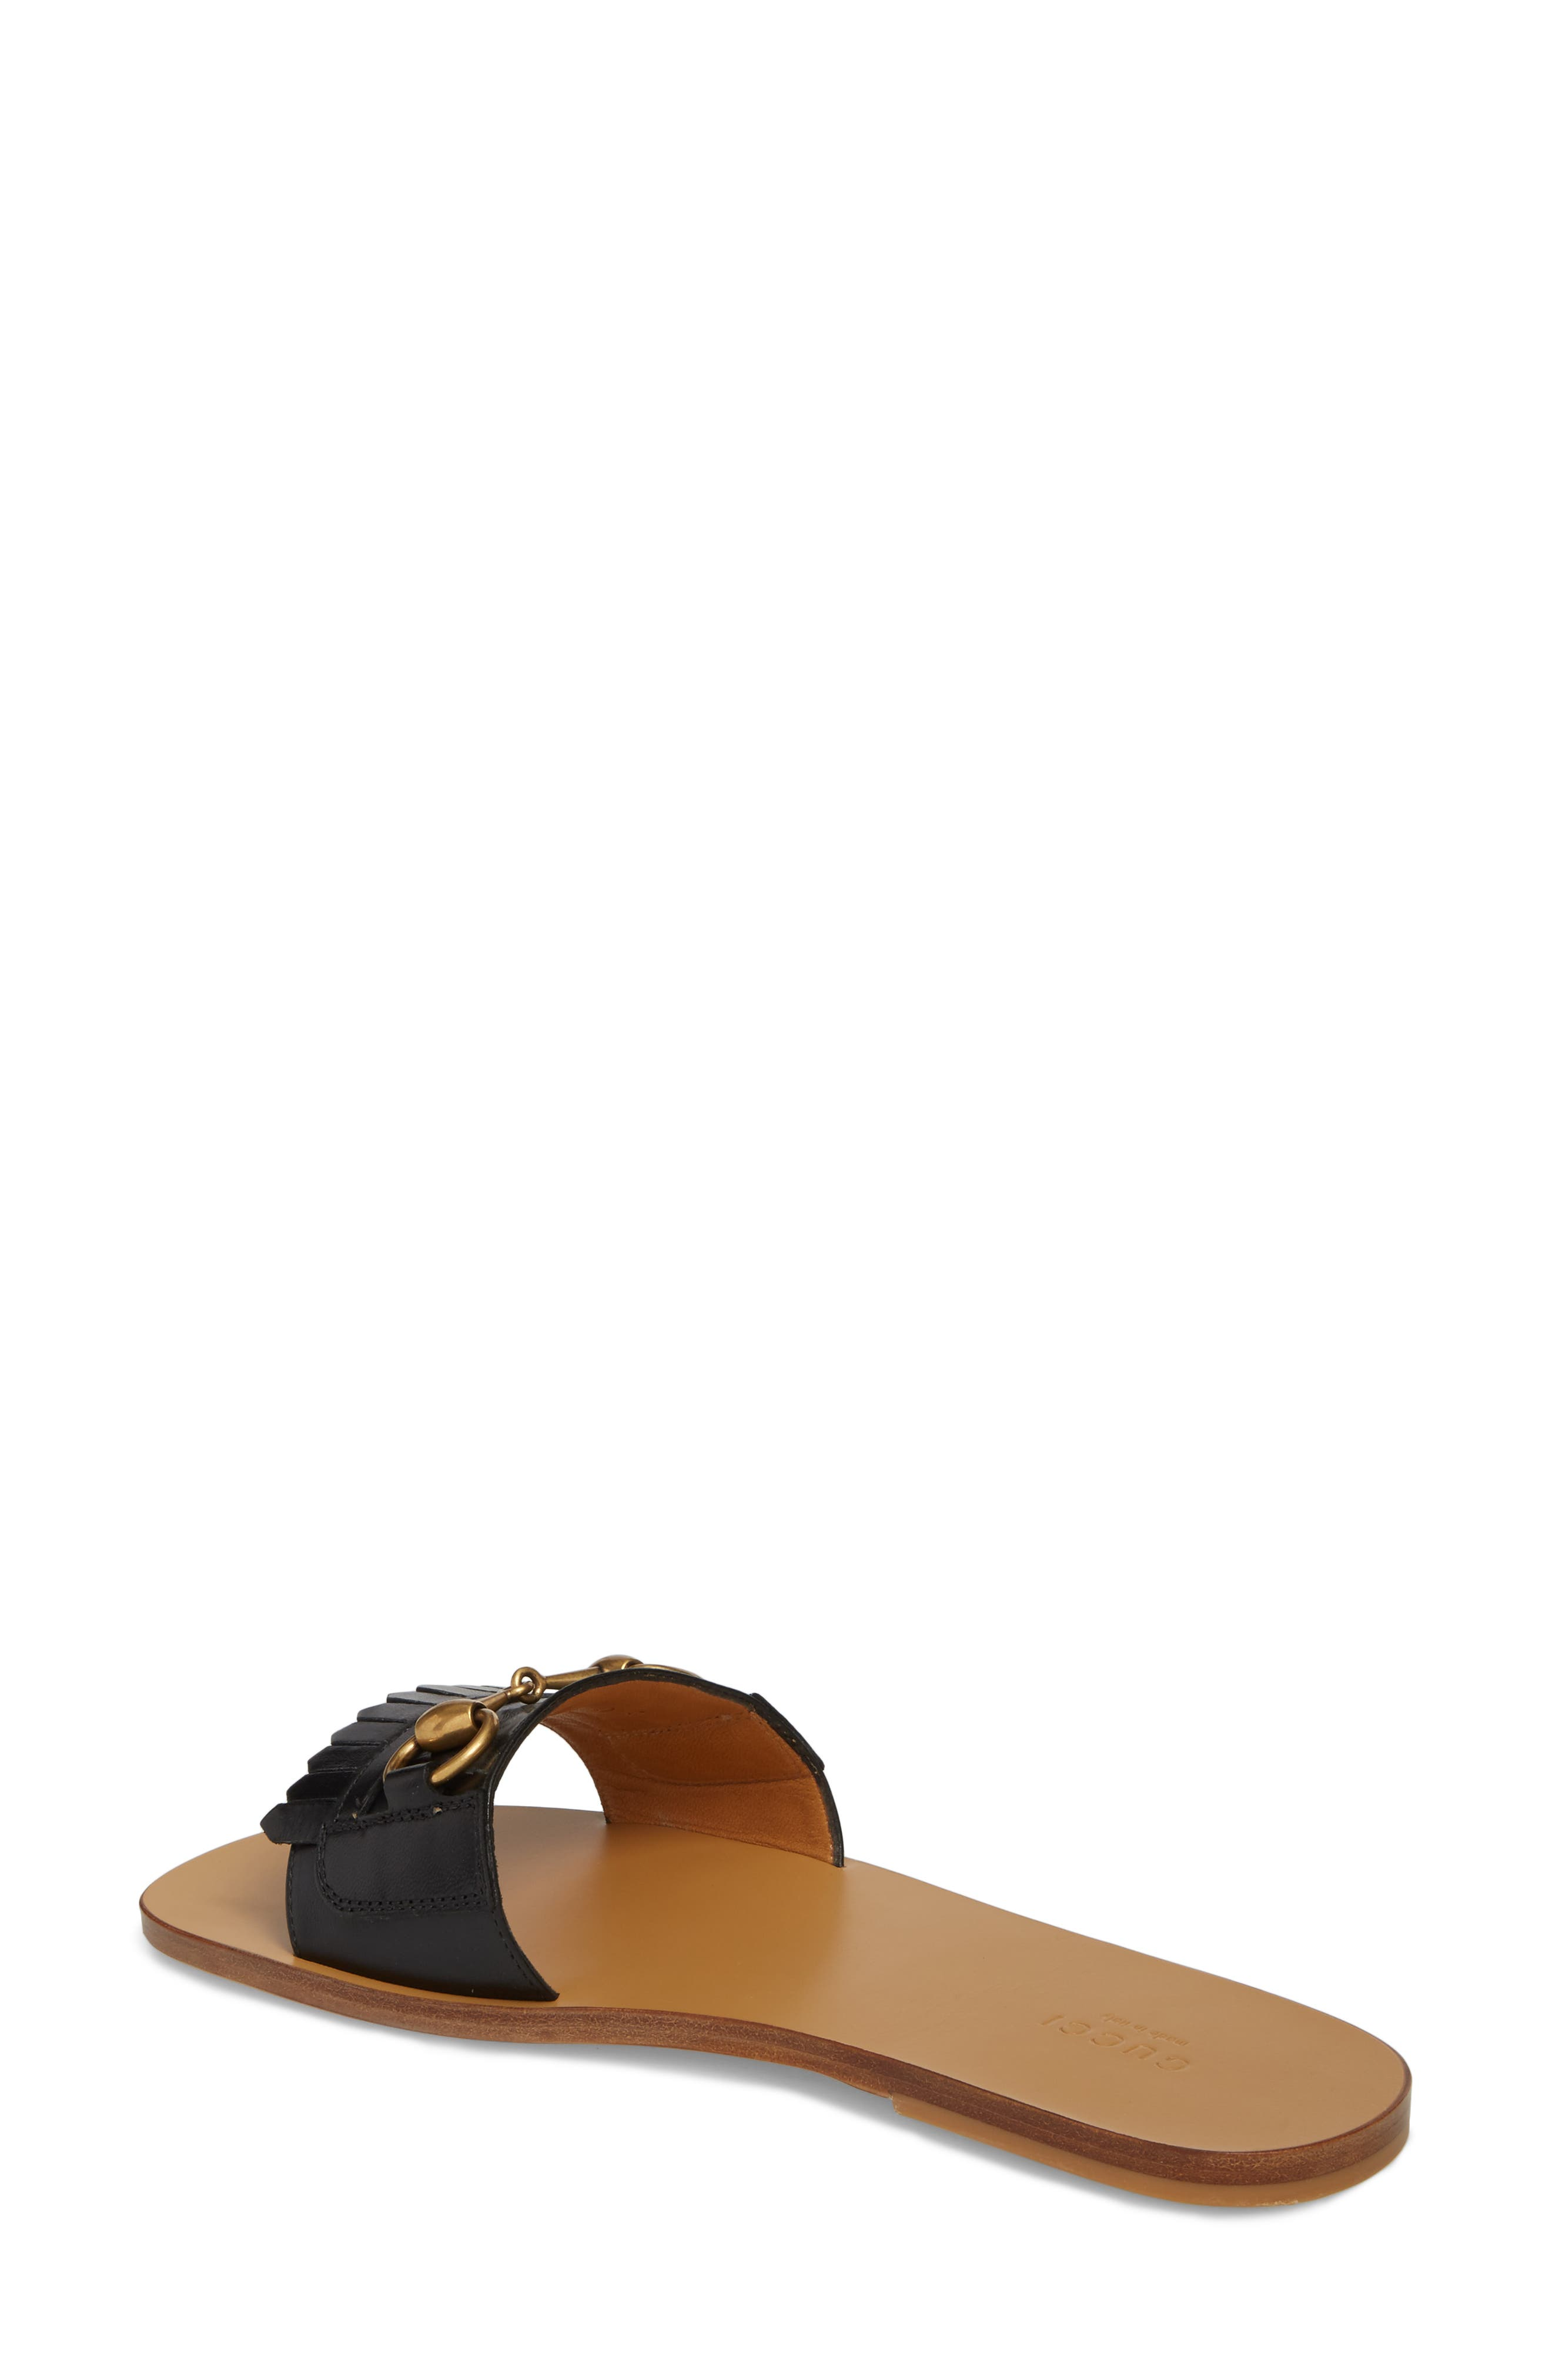 GUCCI, Slide Sandal, Alternate thumbnail 2, color, BLACK